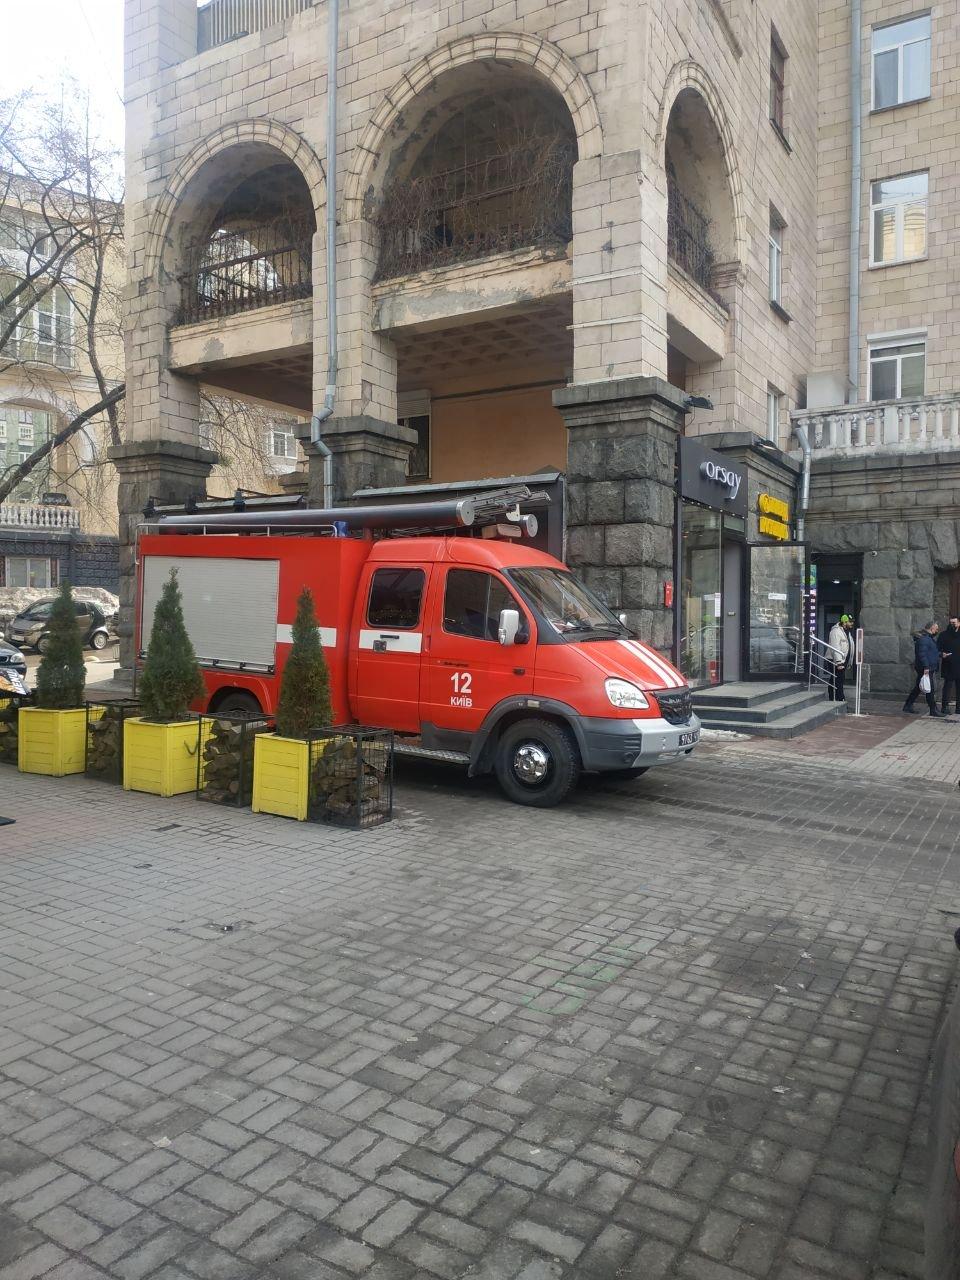 Две станции метро Киева проверяют из-за звонка о минировании, Фото:  ВІКТОР ДАЛЮК 099. 1